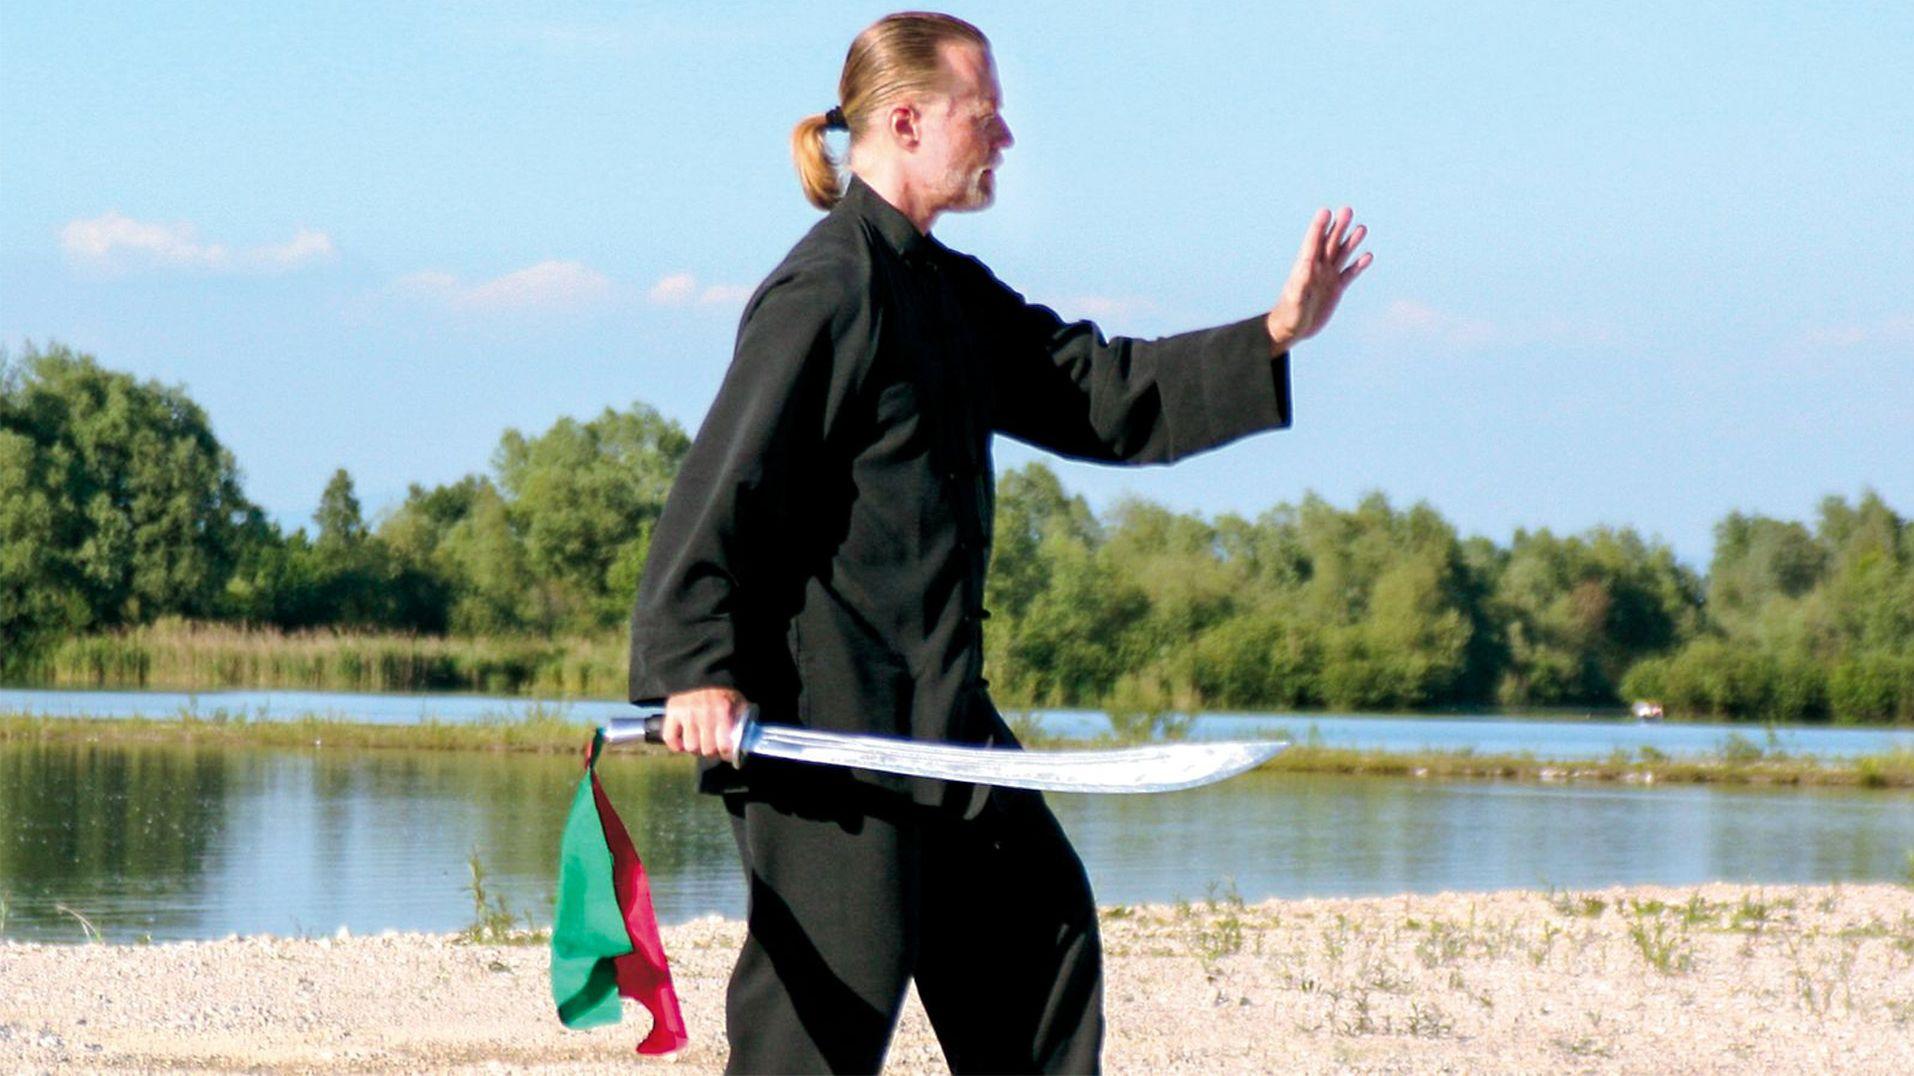 Andreas W Friedrich, Leiter des Instituts Integrales Tai Ji Quan & Qi Gong in München, bei einer Tai Ji Übung an der Isar.